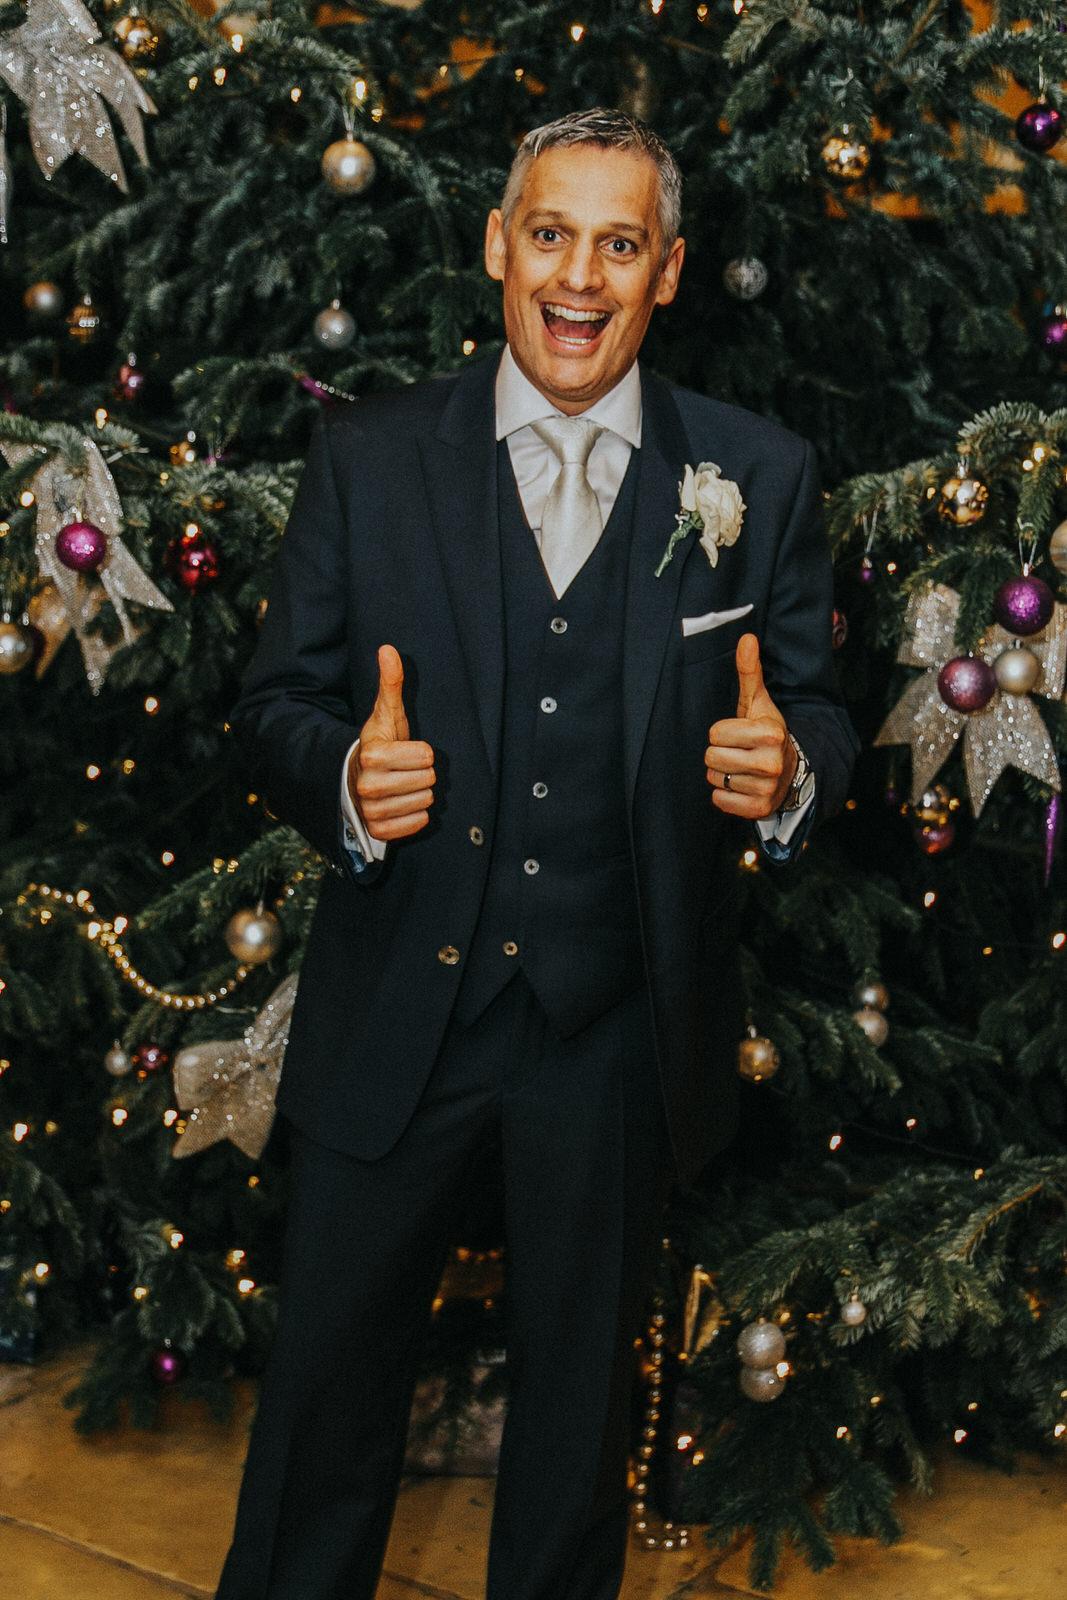 Roger_Kenny_wedding_photographer_Brooklodge__694.jpg